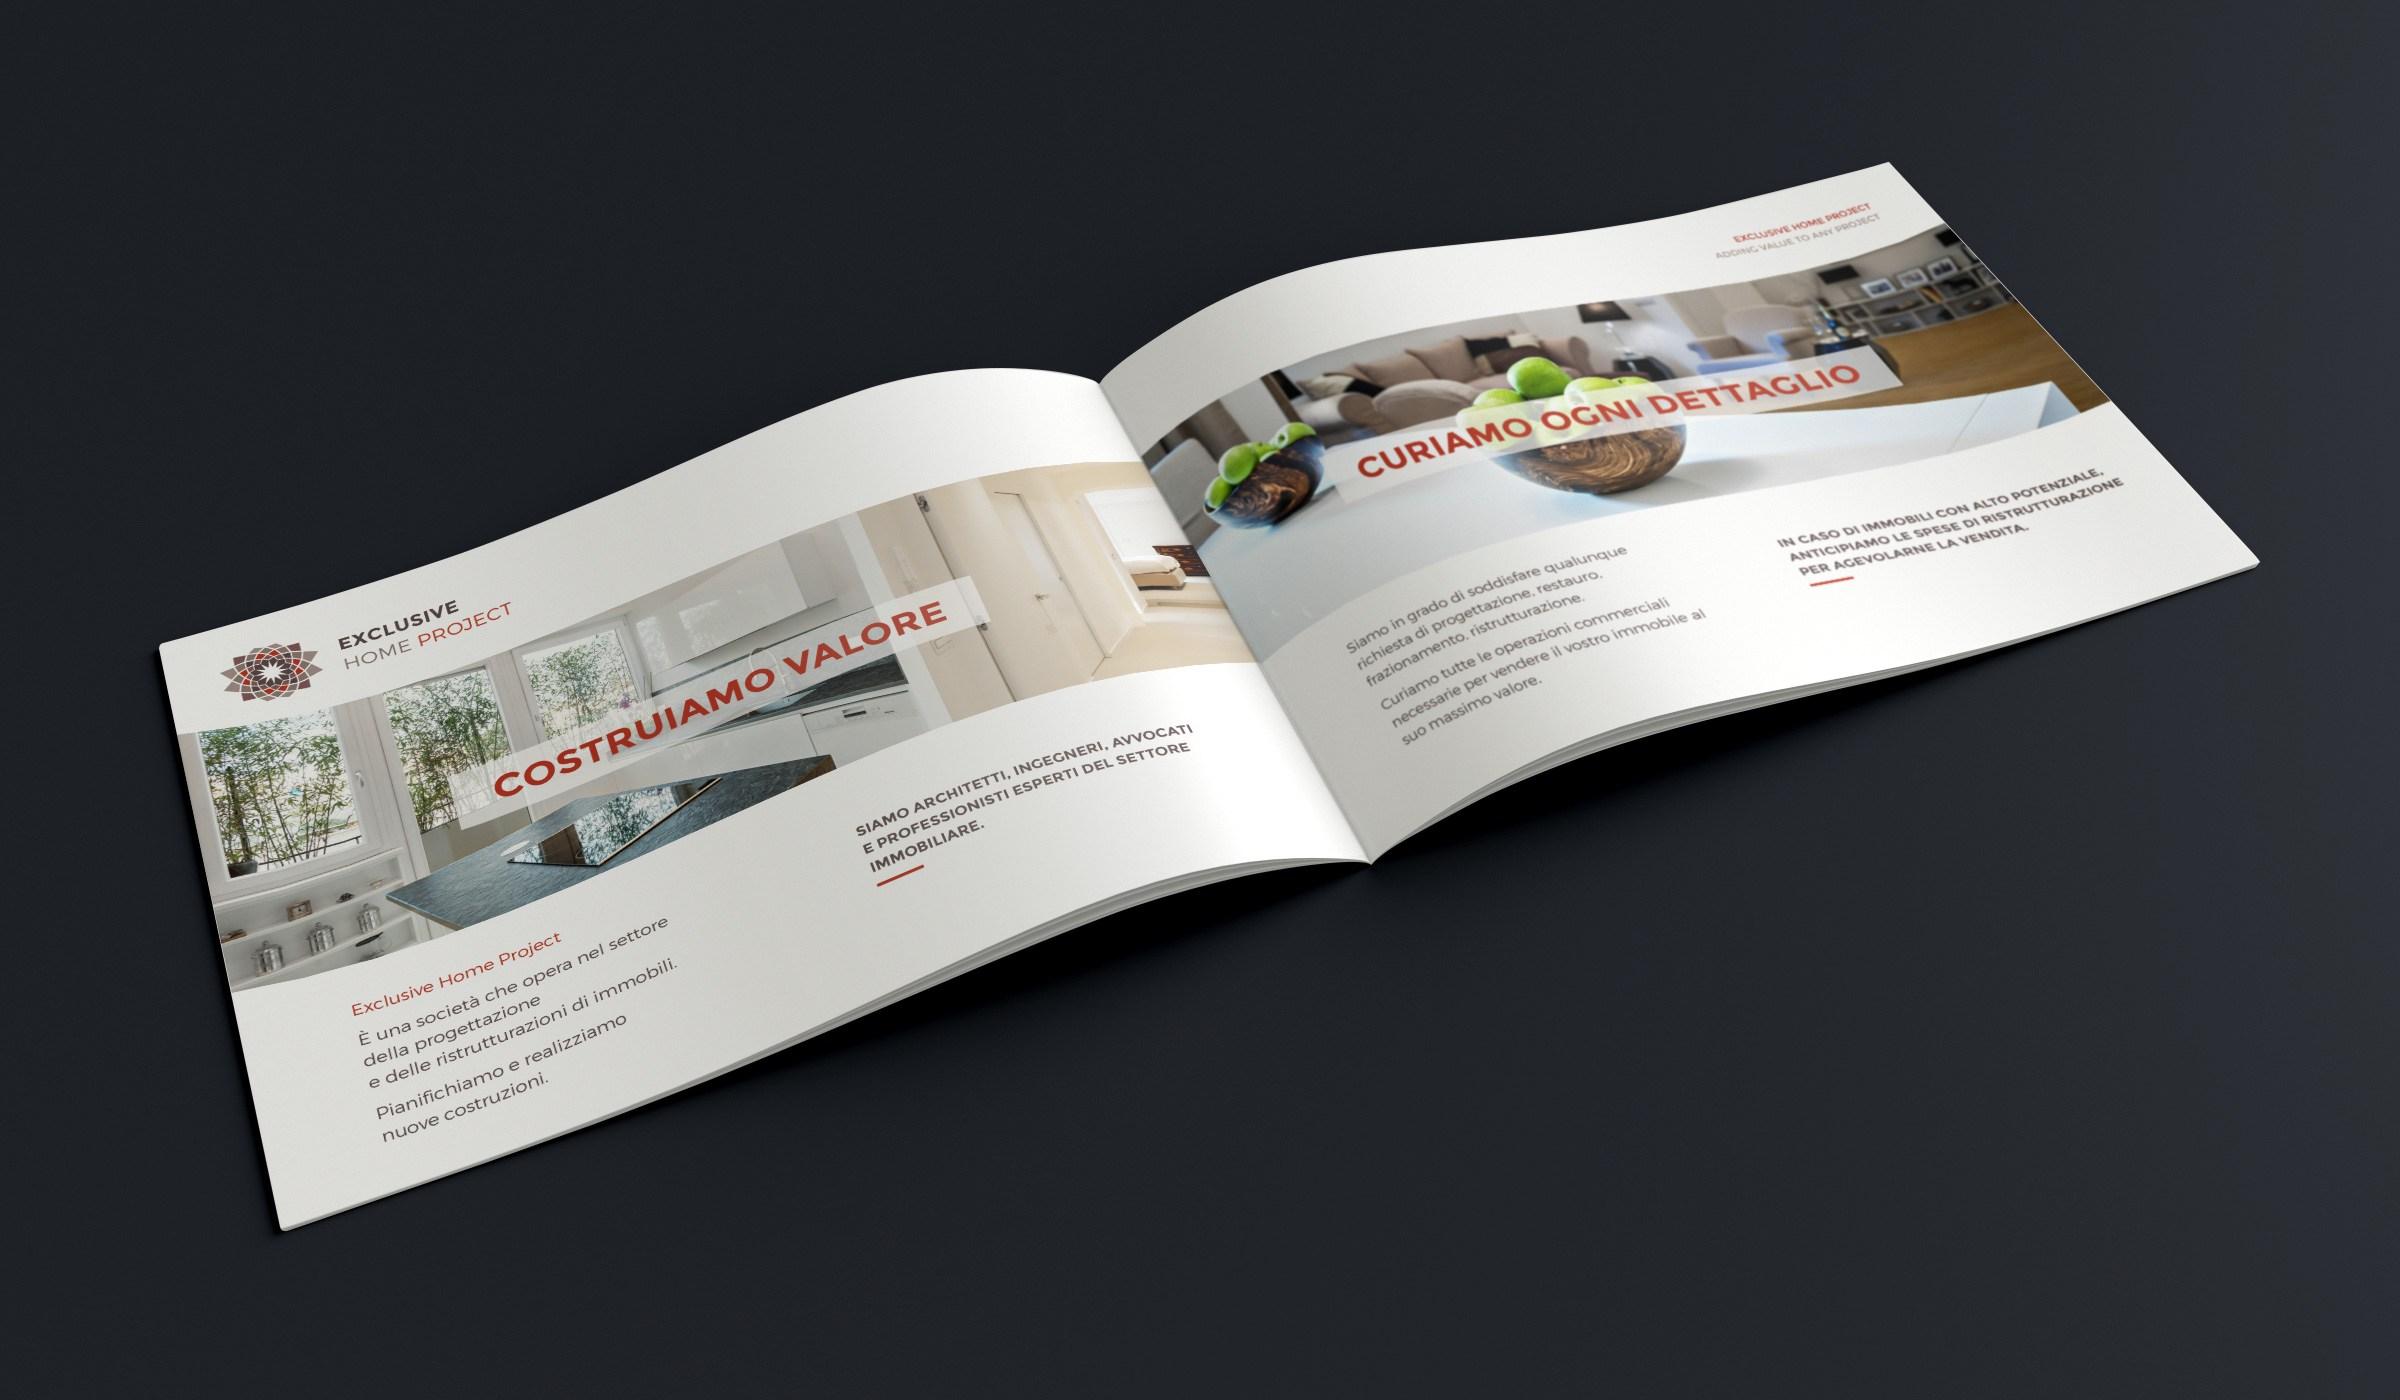 exclusive-home-project-brochure2-scriptaimago